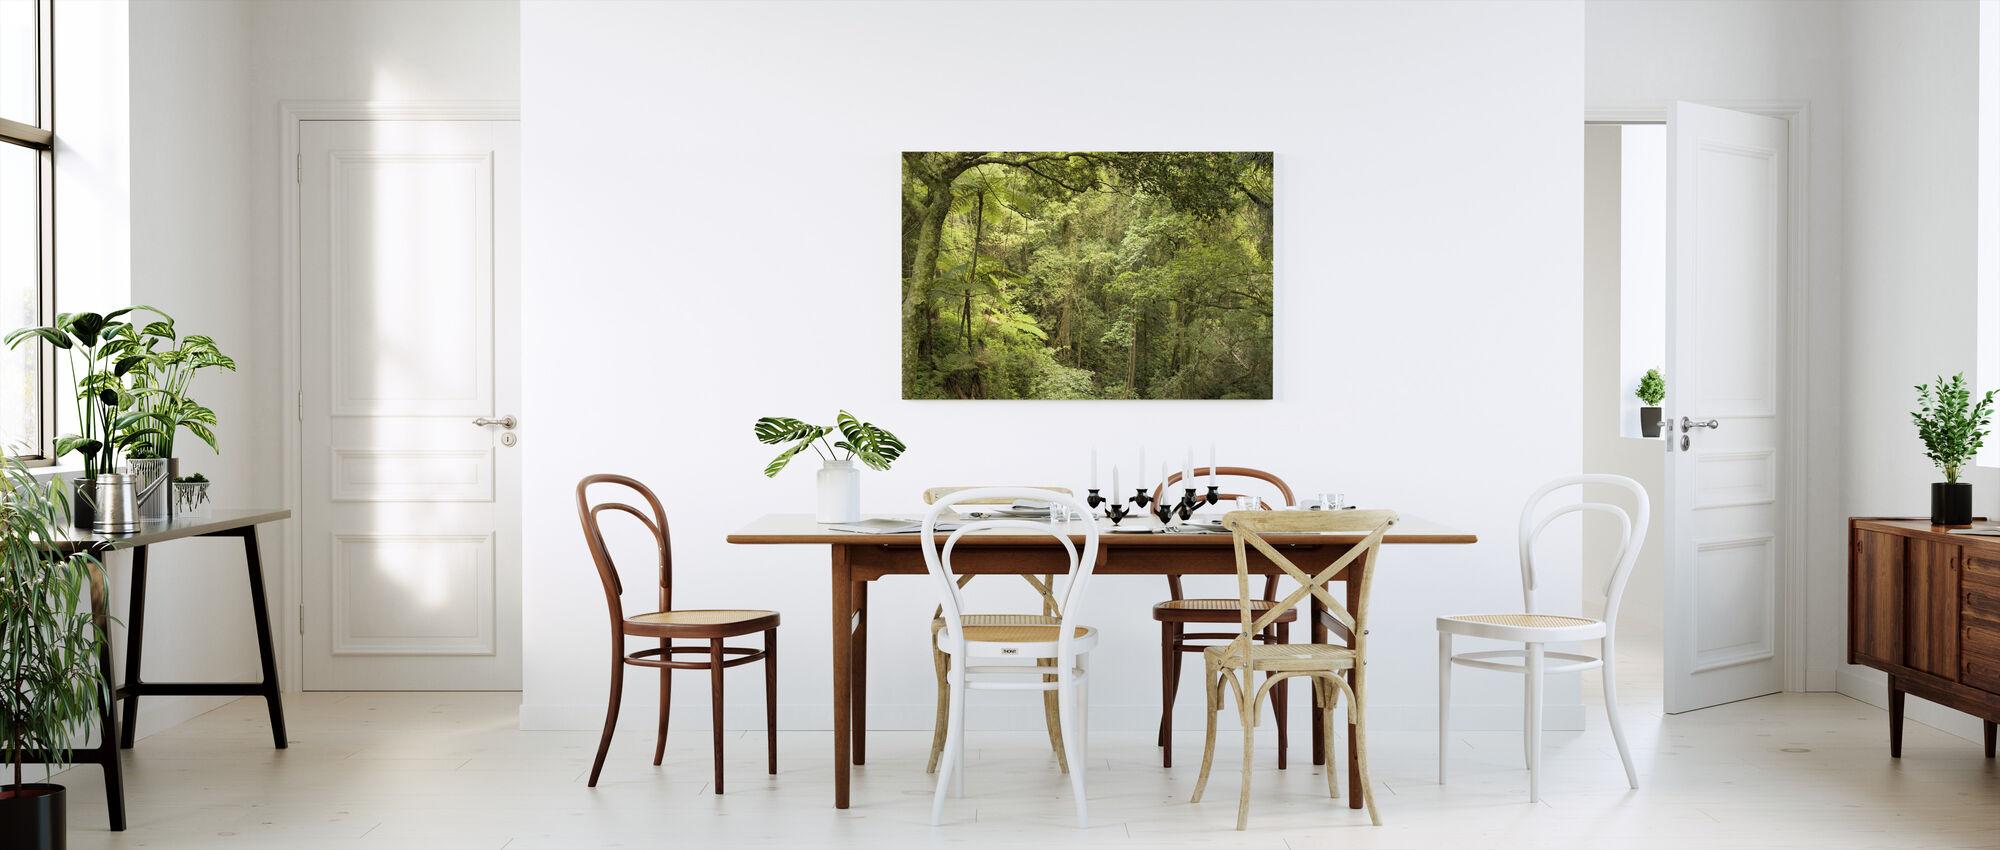 Nationaal park Bunya-gebergte - Canvas print - Keuken